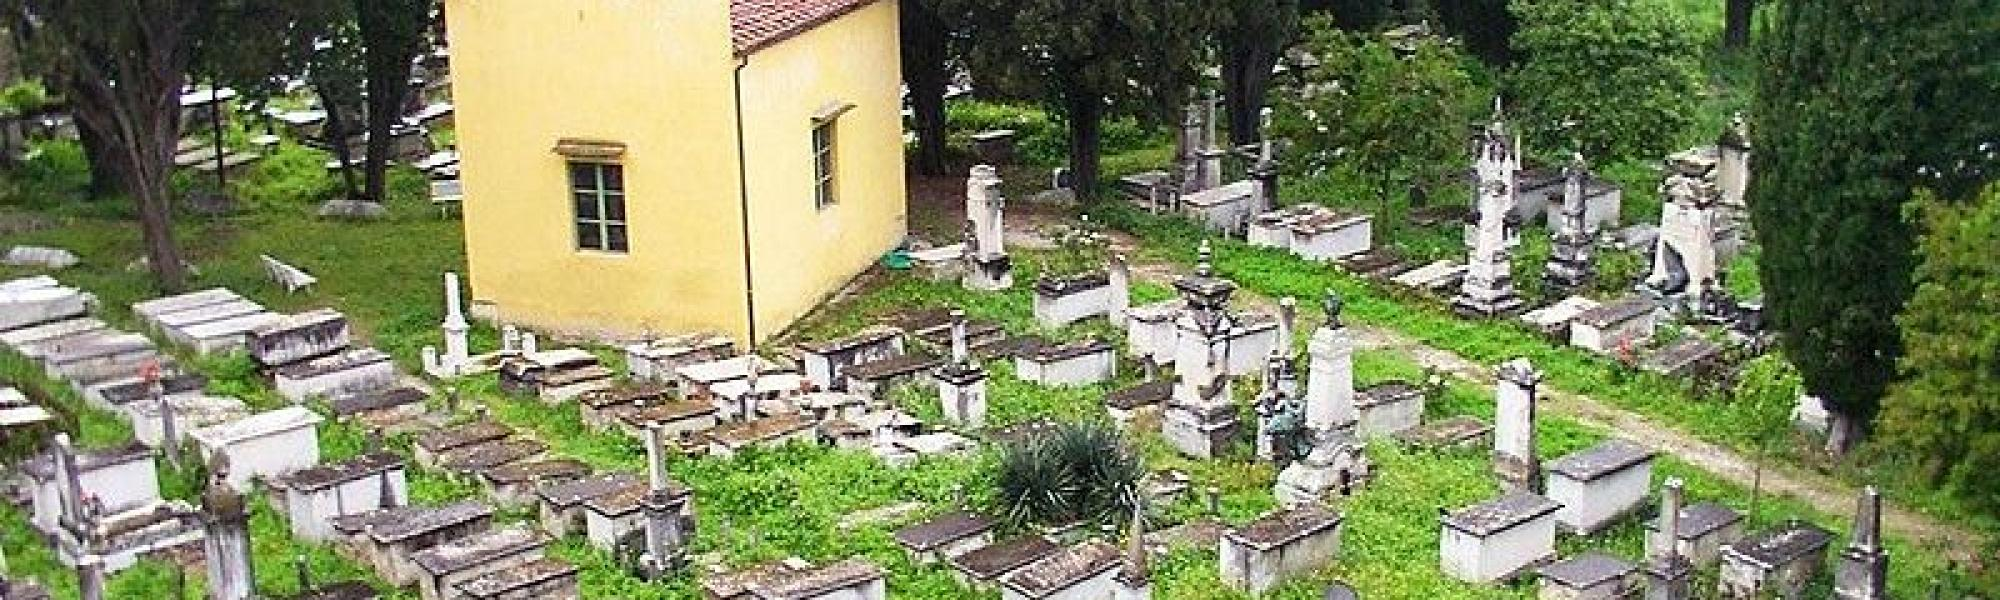 Pisa Jews Cemetery